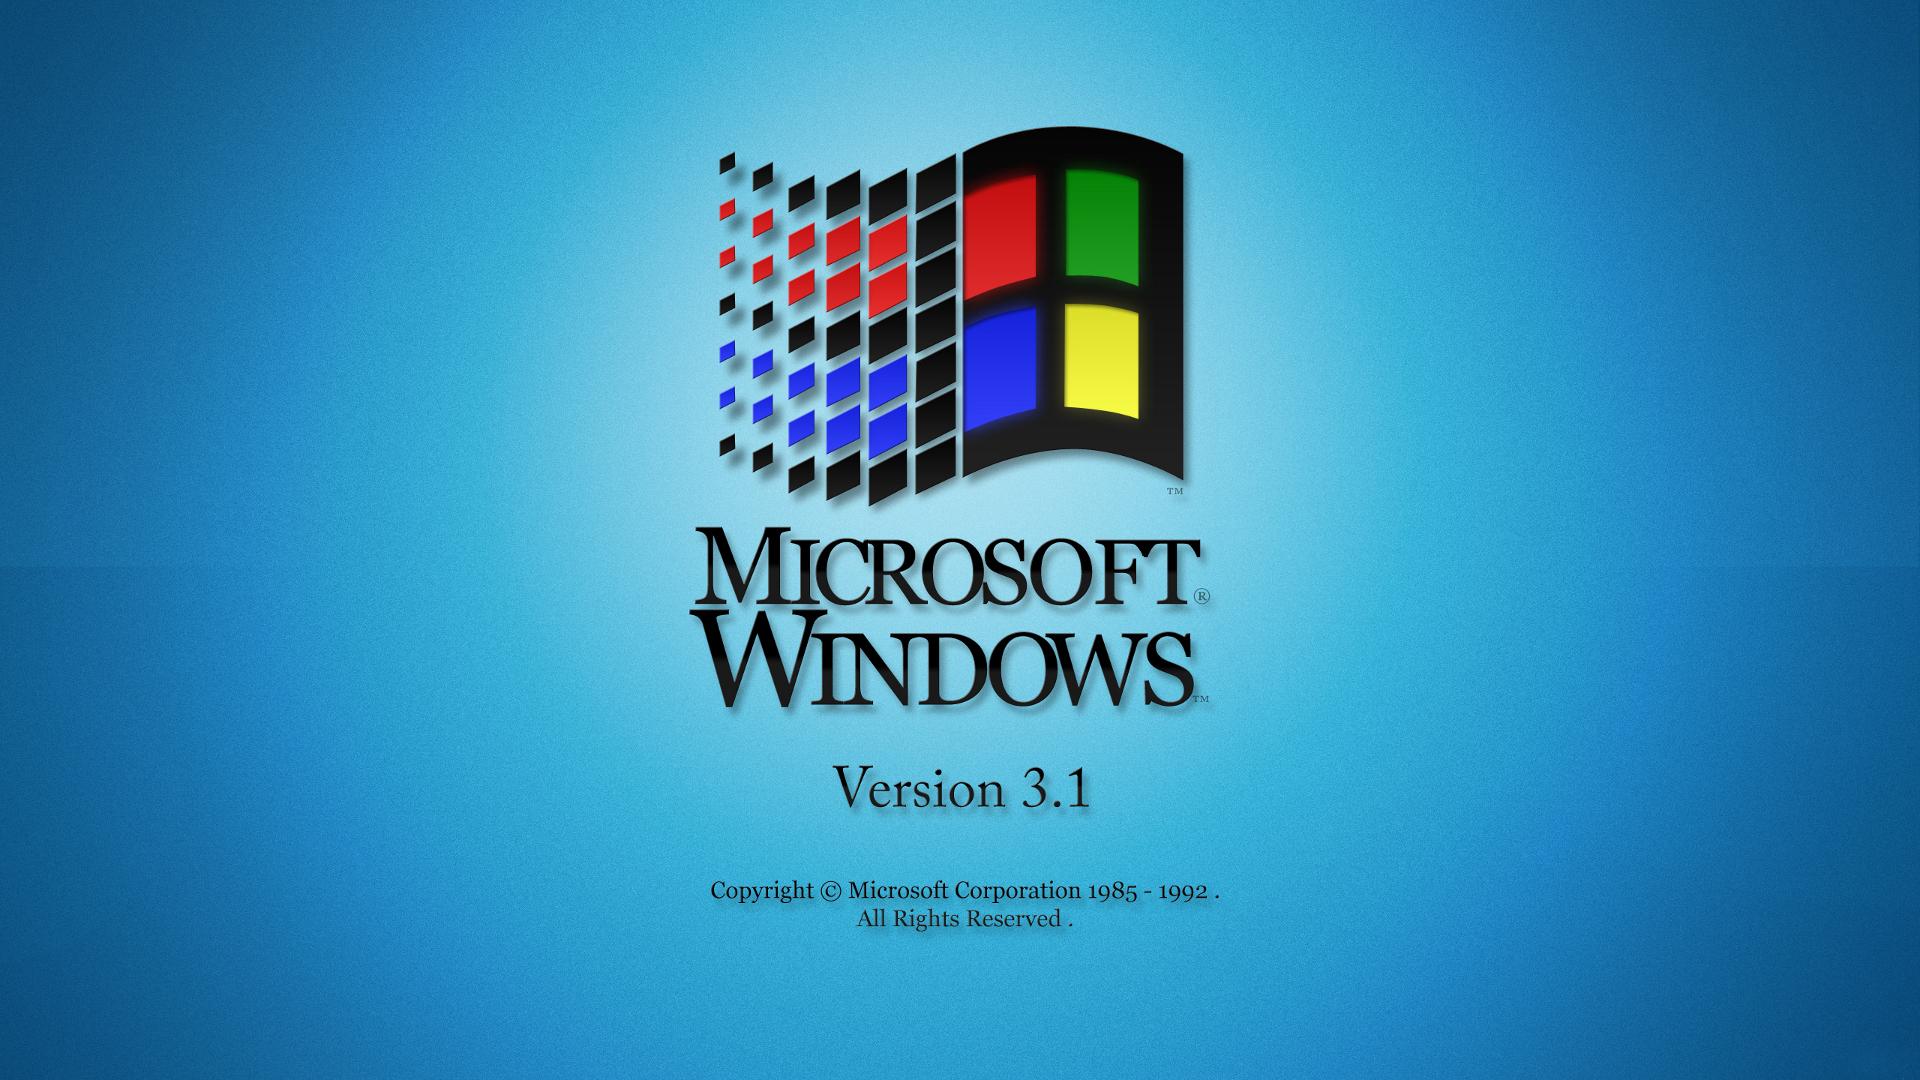 1920x1080 Microsoft Windows Version 31 desktop PC and Mac wallpaper 1920x1080